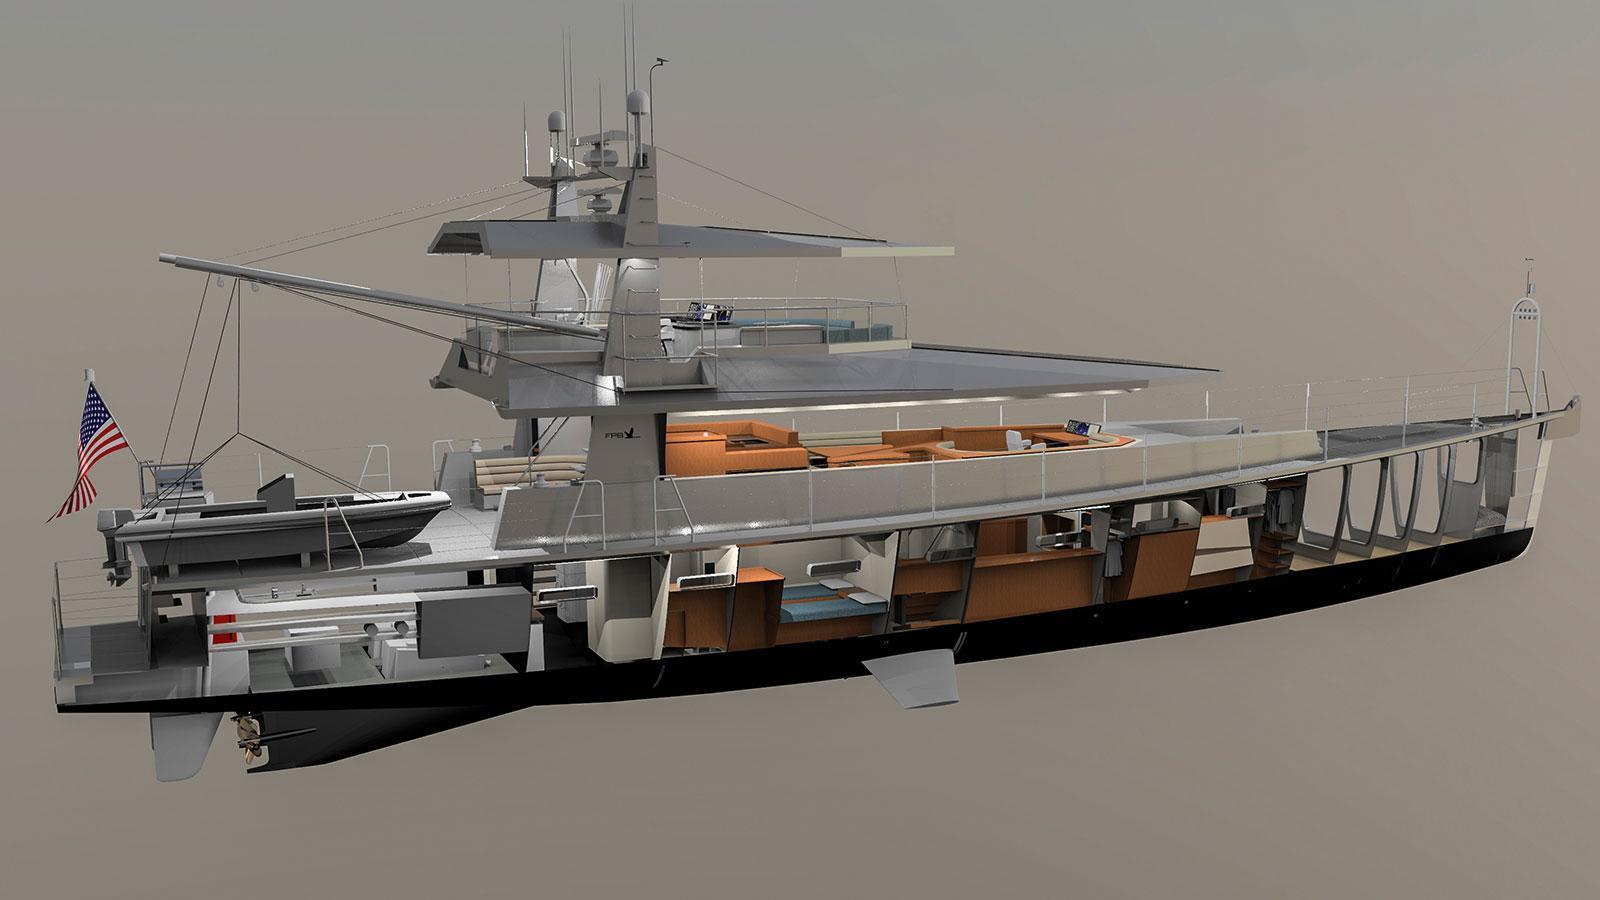 iceberg-motor-yacht-circa-marine-fpb-97-2015-34m-draught